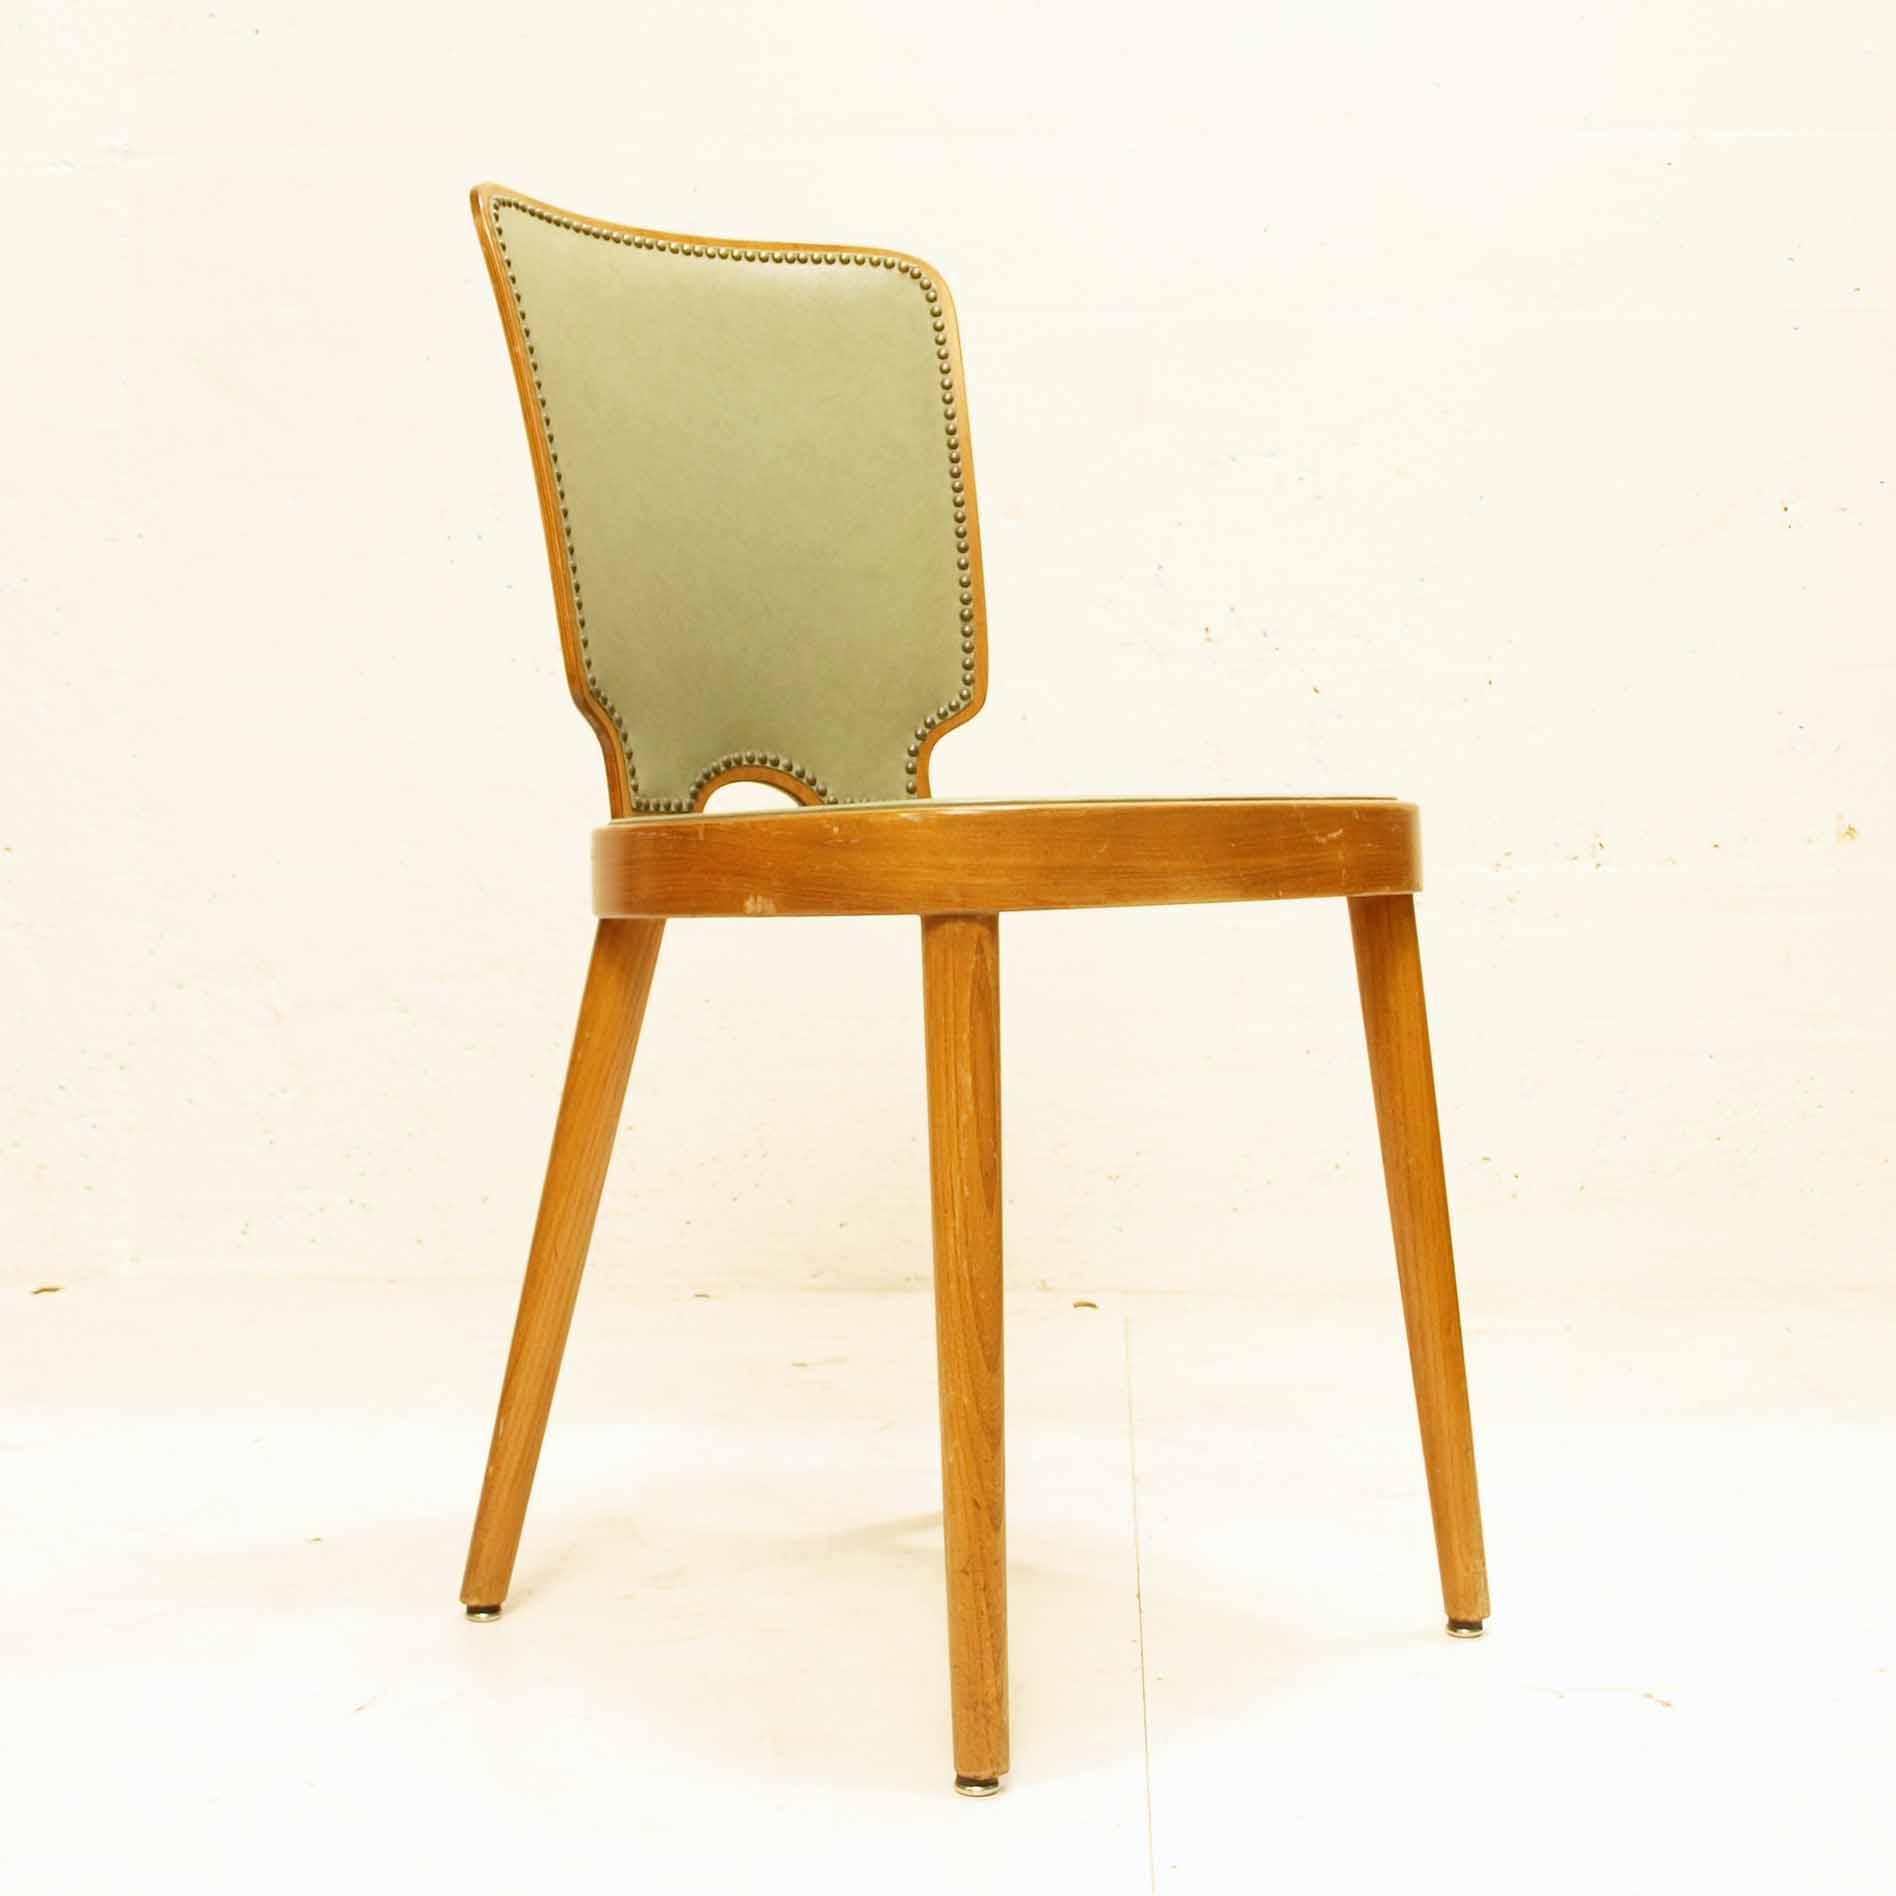 Stuhl ist grn normann copenhagen form stuhl grn - Stuhl mit nieten ...